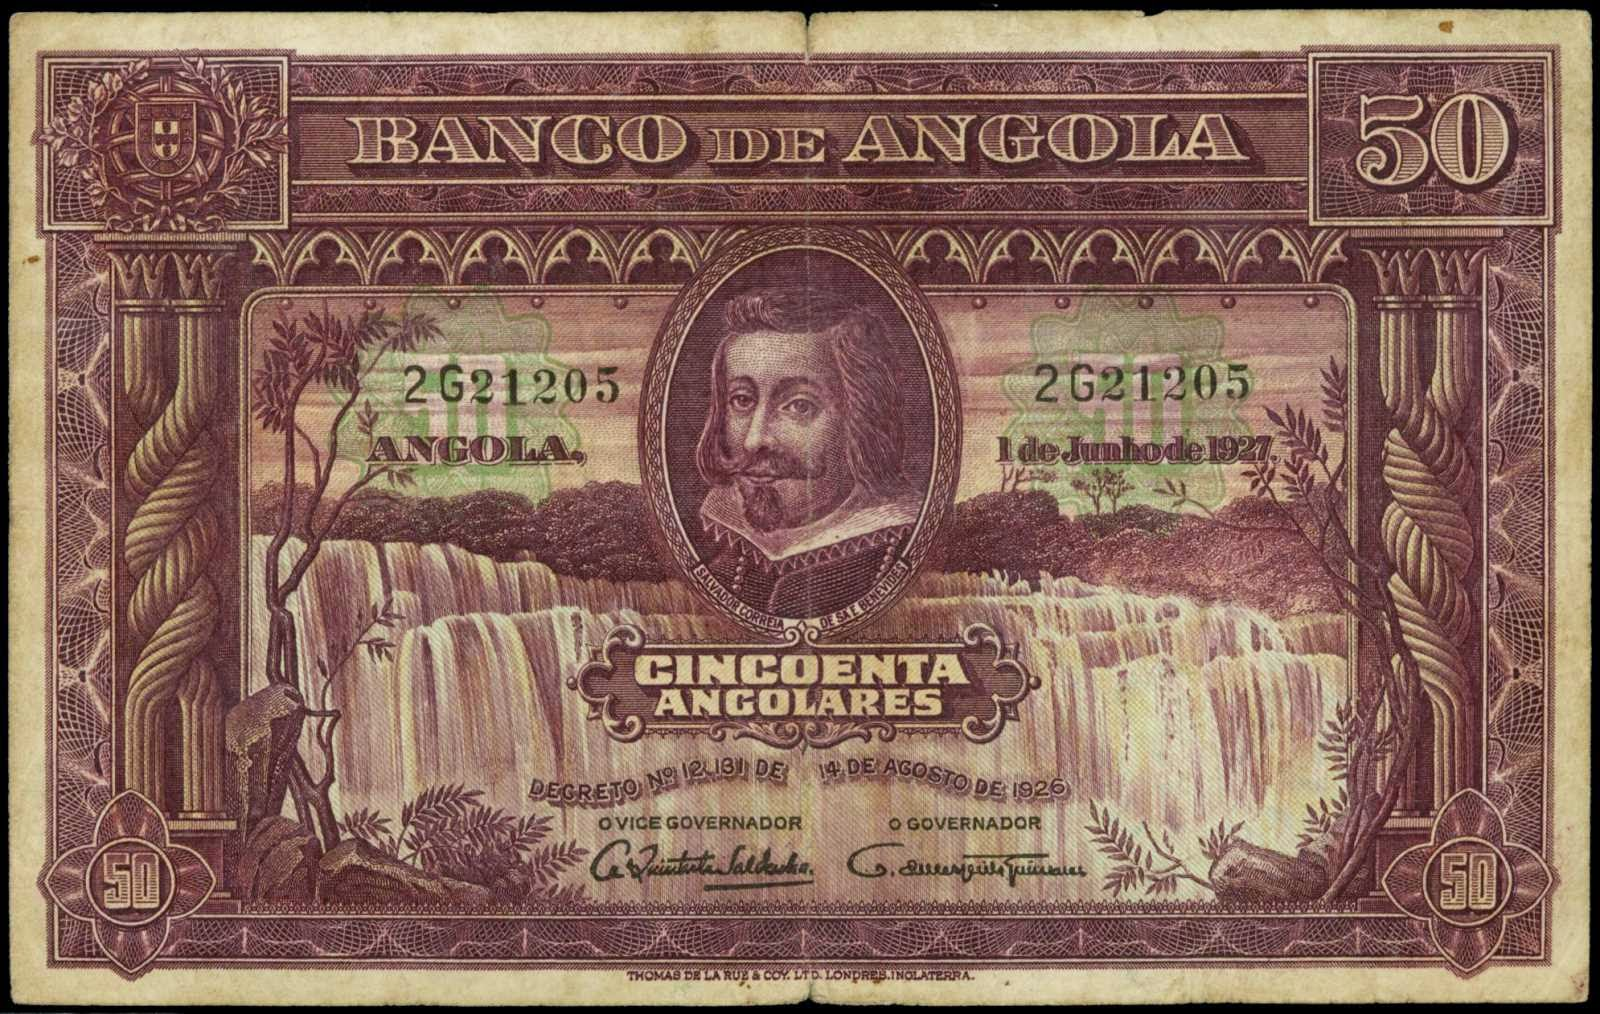 Angola 50 Angolares banknote 1927 Salvador Correia